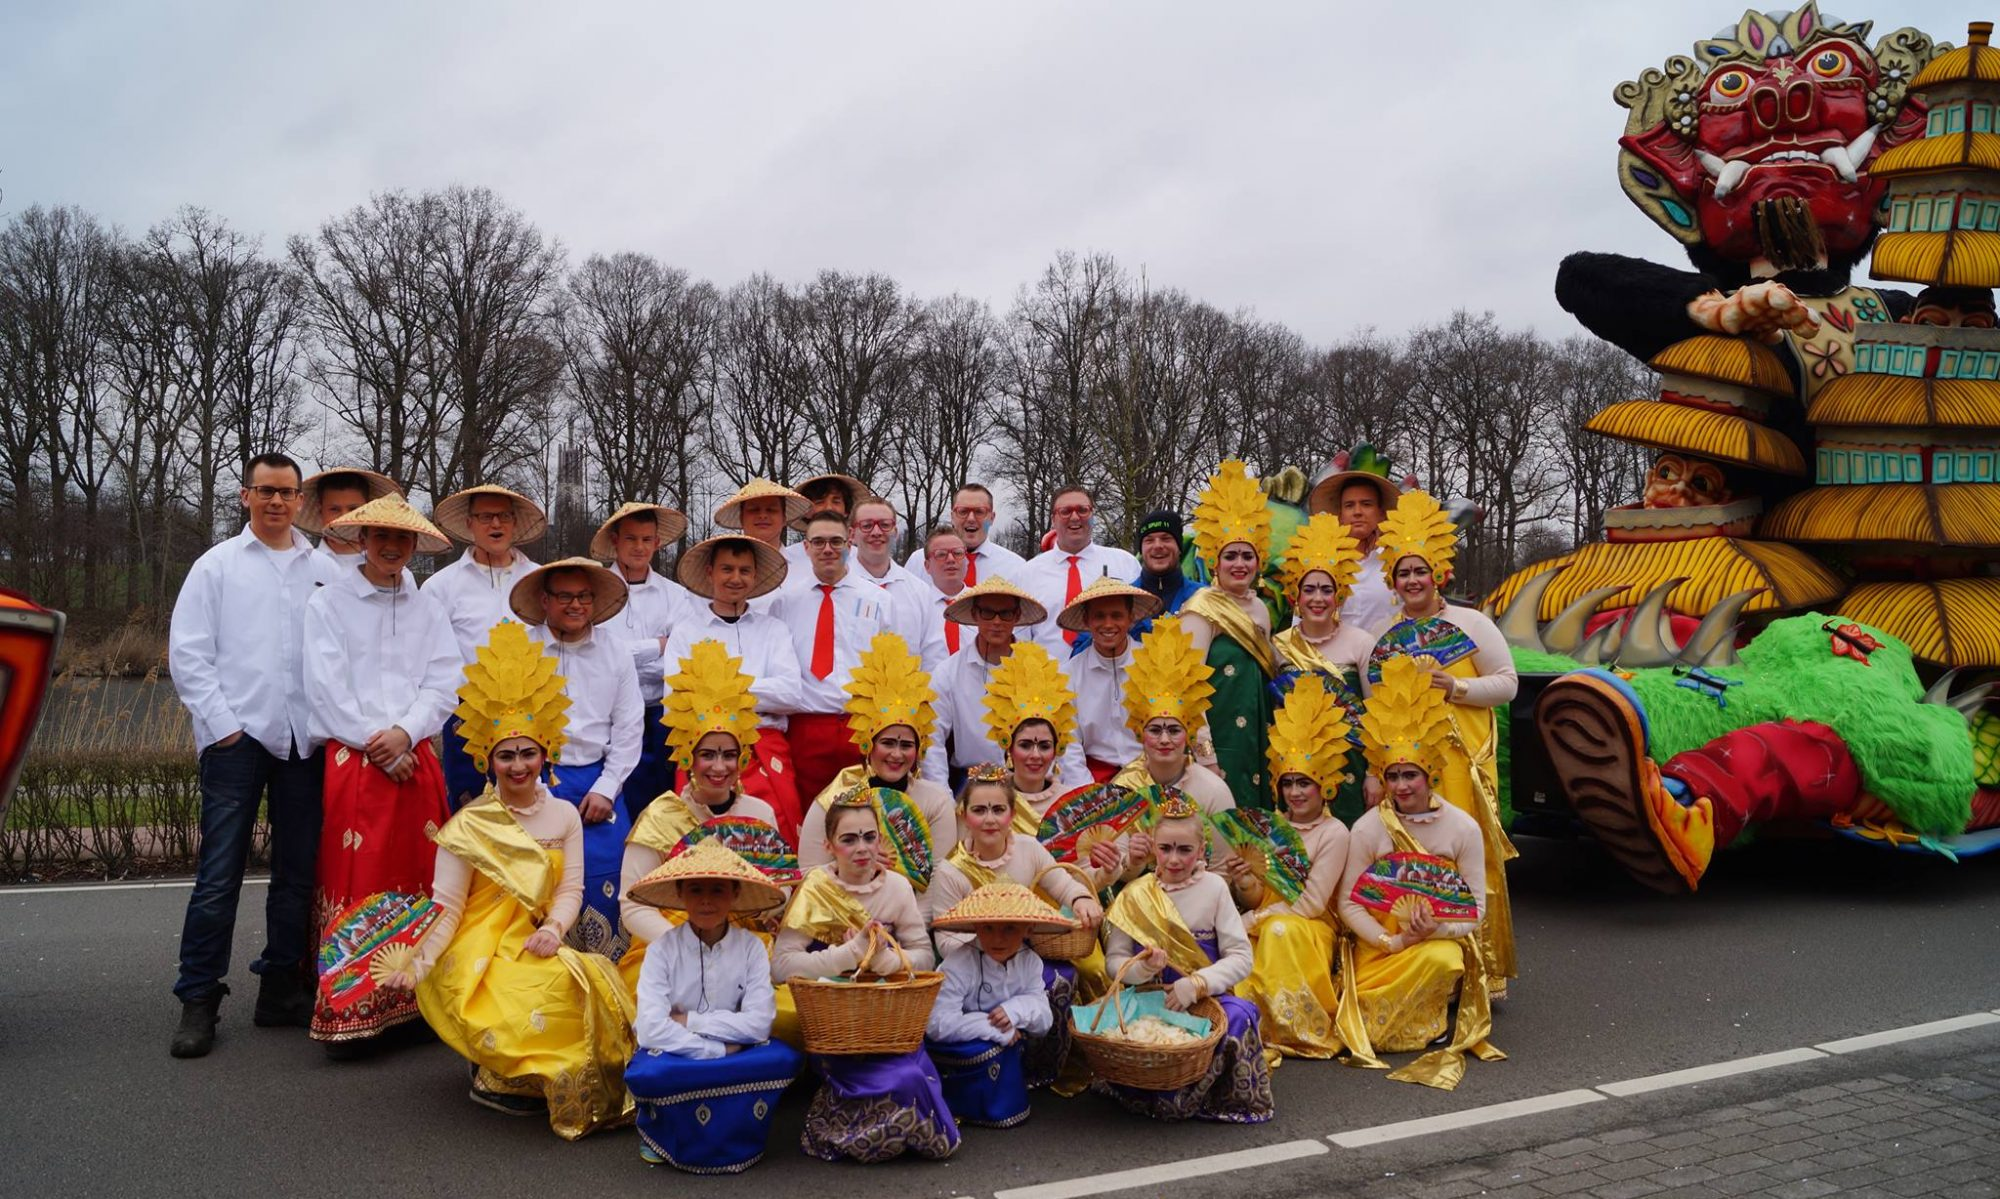 Carnavalsvereniging Spuit 11